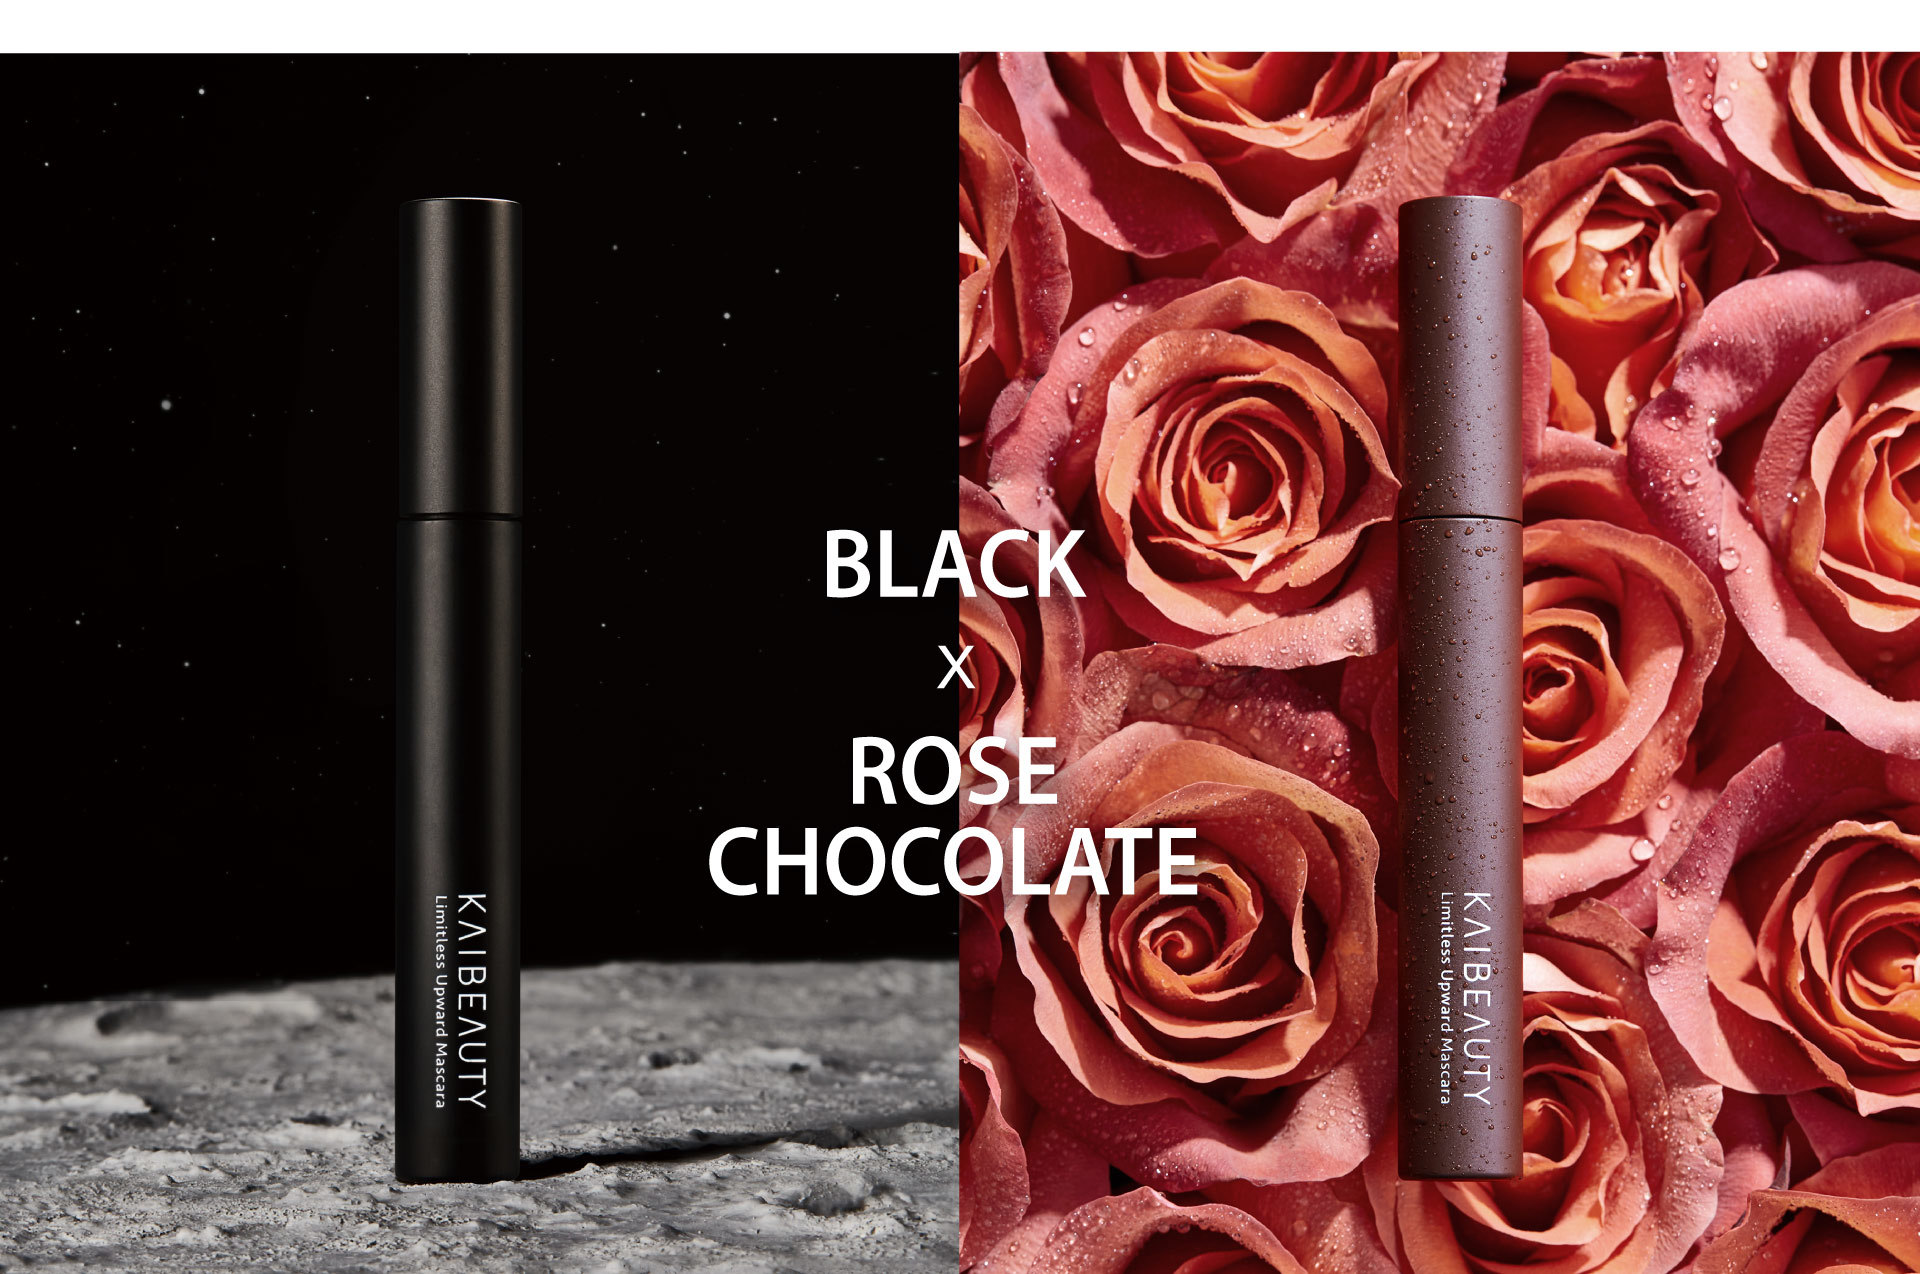 kaibeauty, mascara, rose chocolate, eyelash, eye, limitless upward mascara, shipping, makeup, 小凱